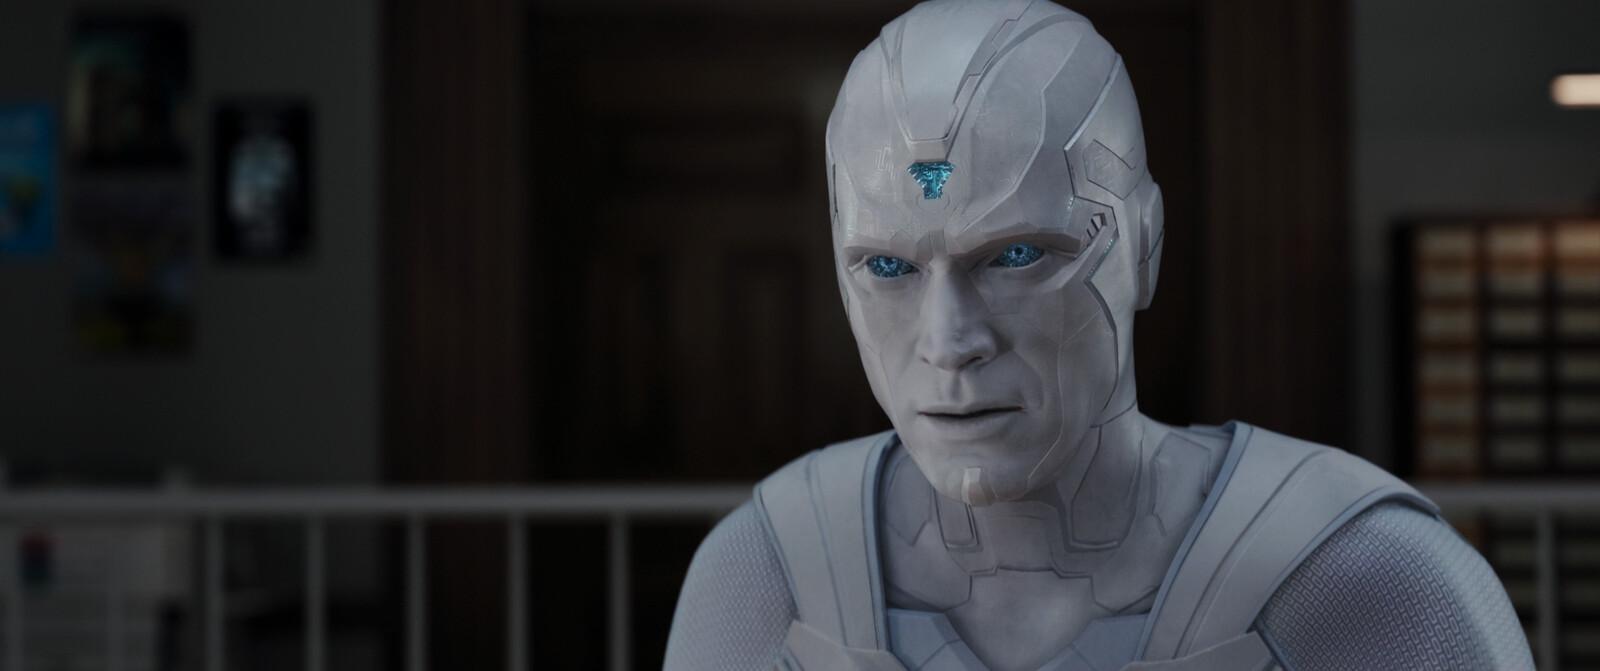 White Vision - Facial Rigging